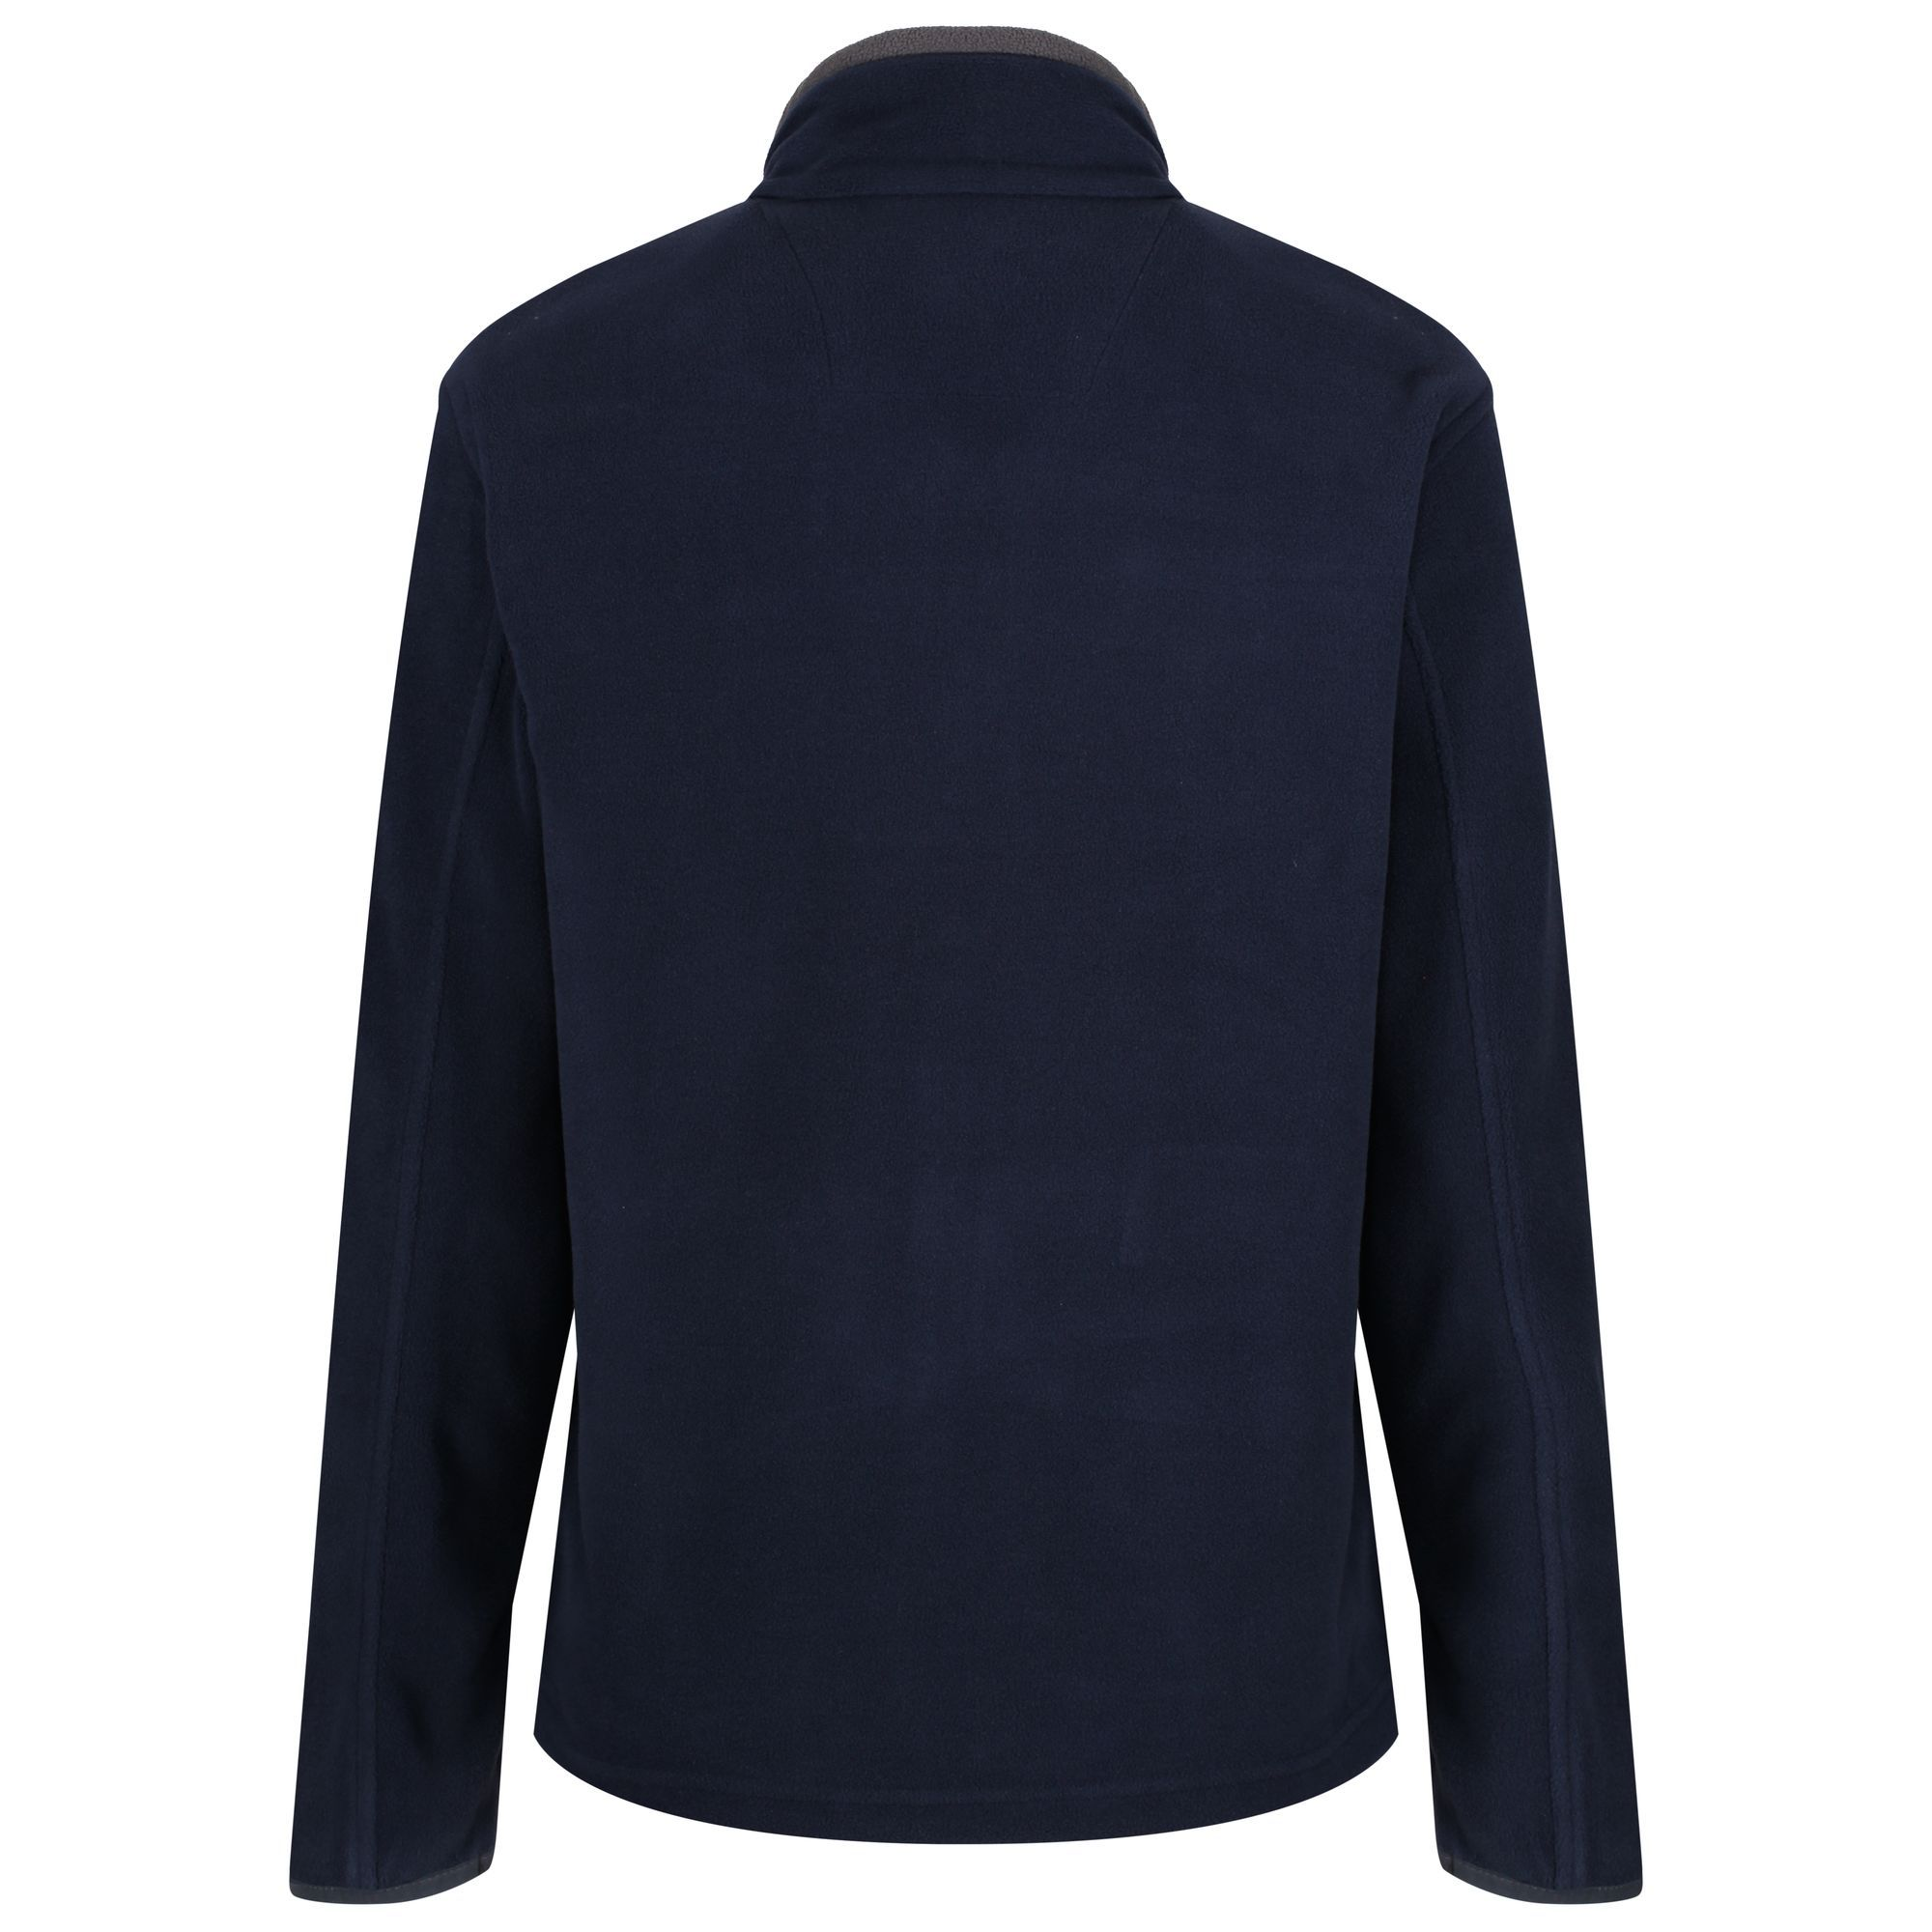 Regatta-Stanton-II-Mens-Warm-Mid-Weight-Full-Zip-Golf-Fleece-Jacket-RRP-40 thumbnail 6